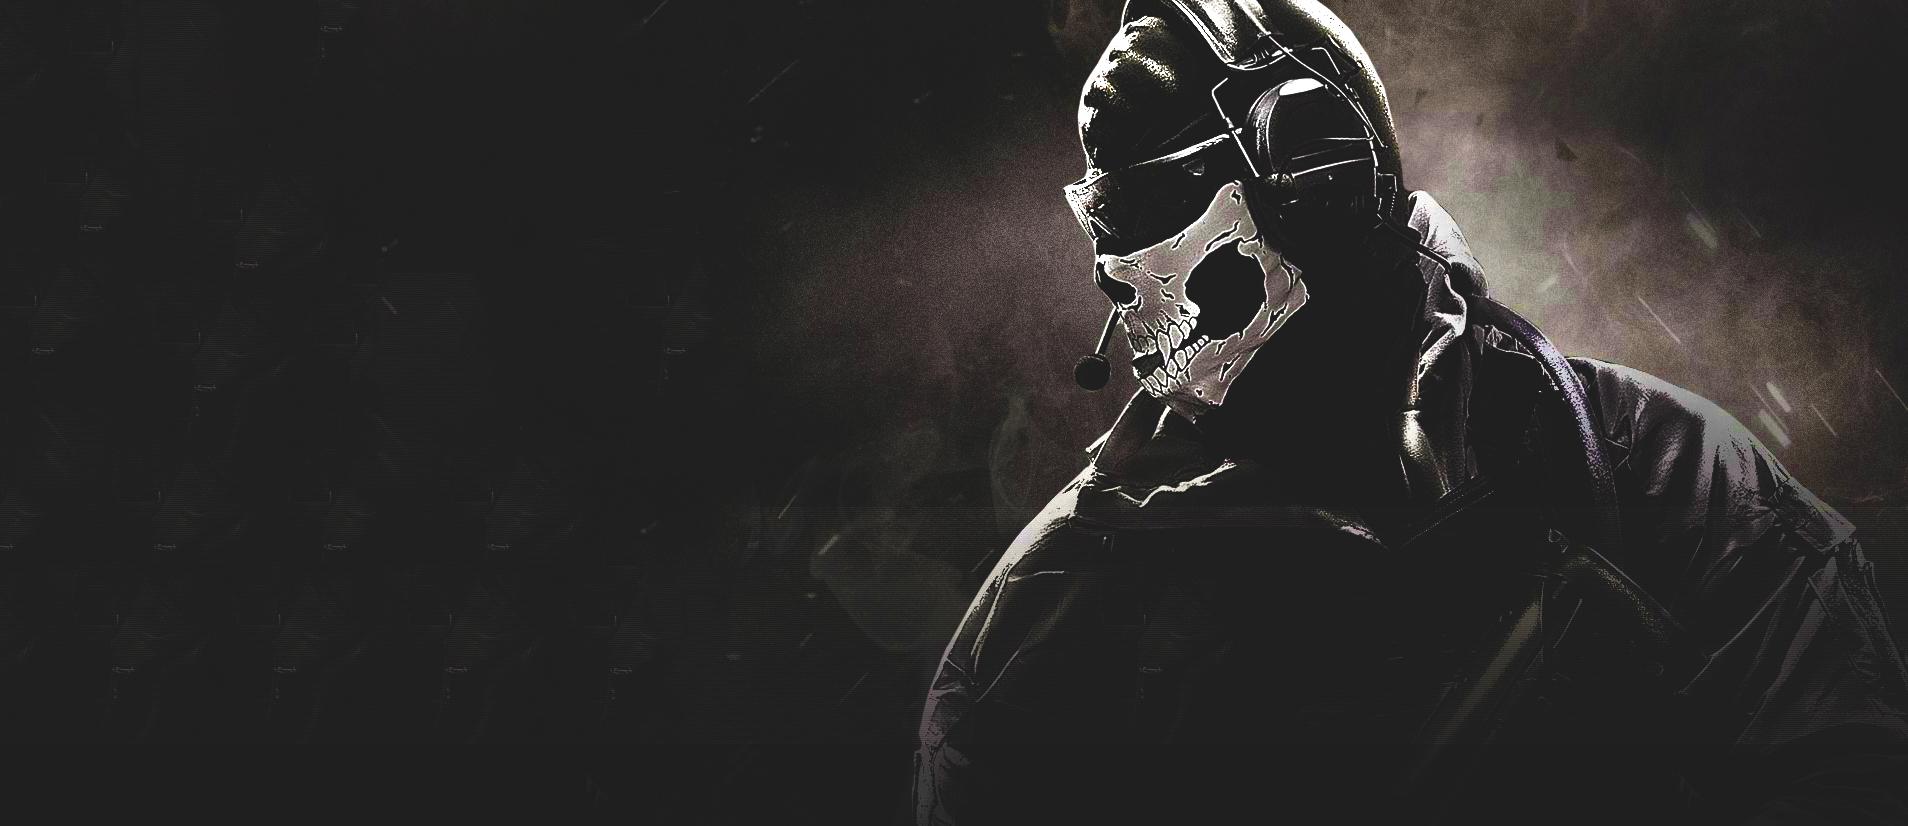 Wallpaper Ghost Call Of Duty Call Of Duty 4 Modern Warfare